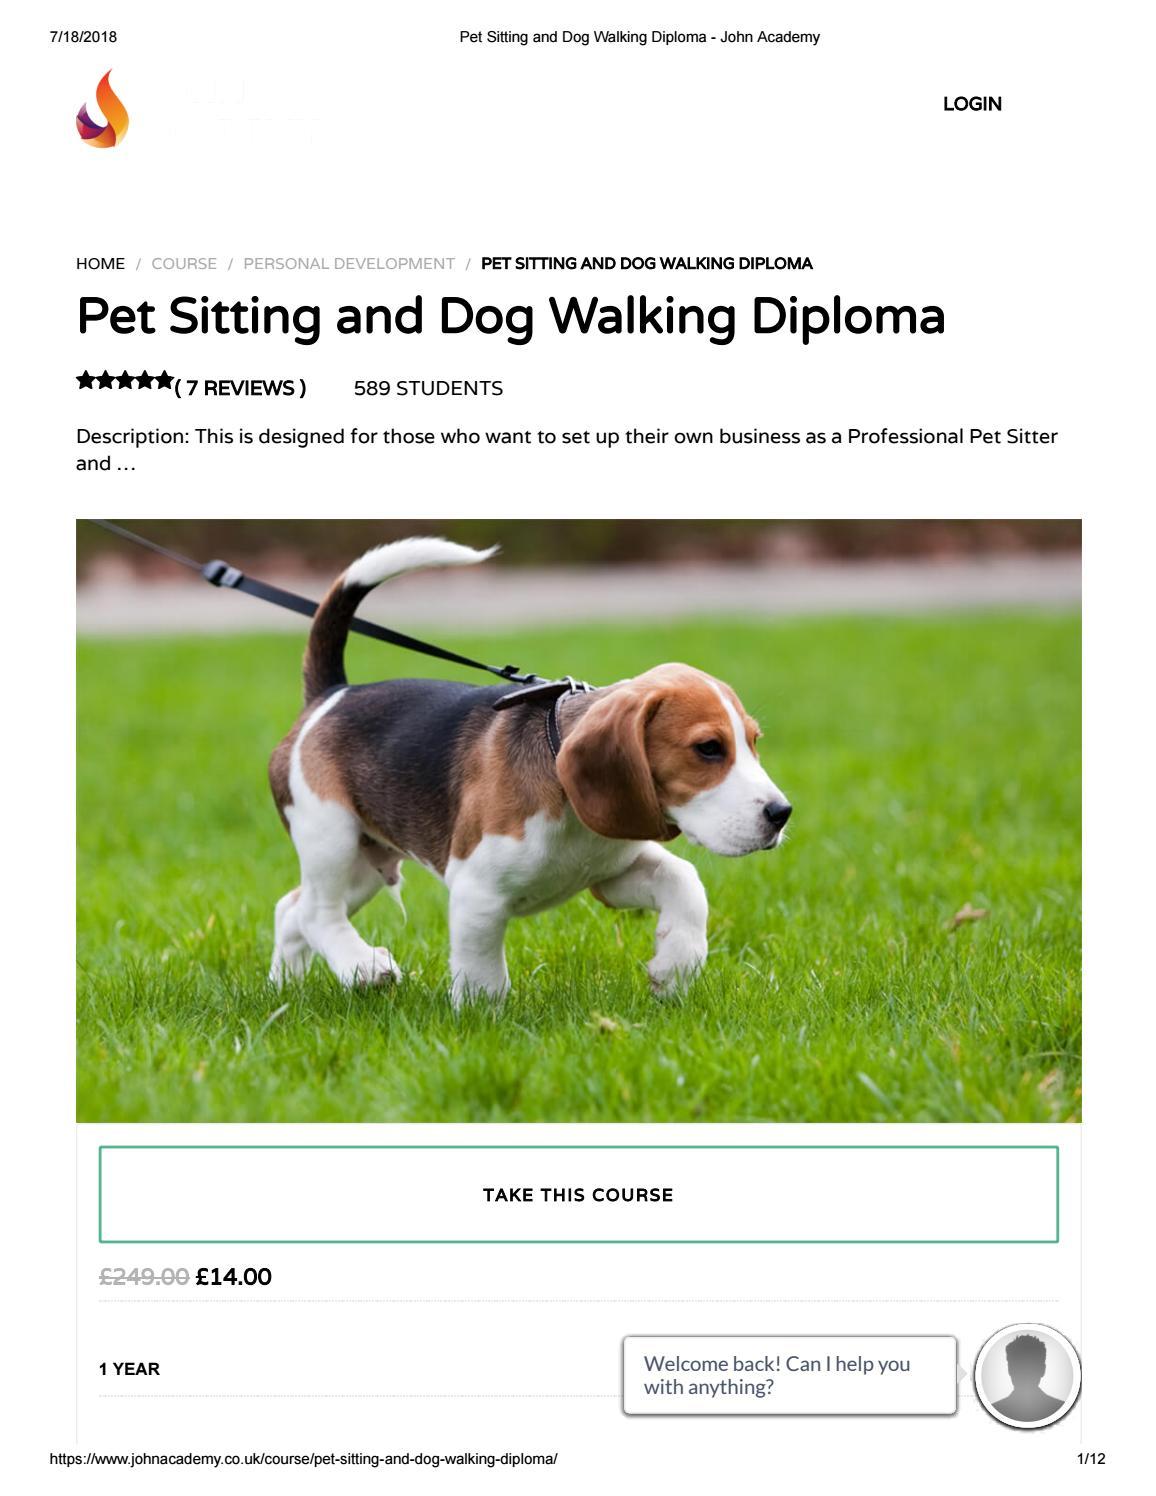 Pet Sitting And Dog Walking Diploma John Academy By Issuu